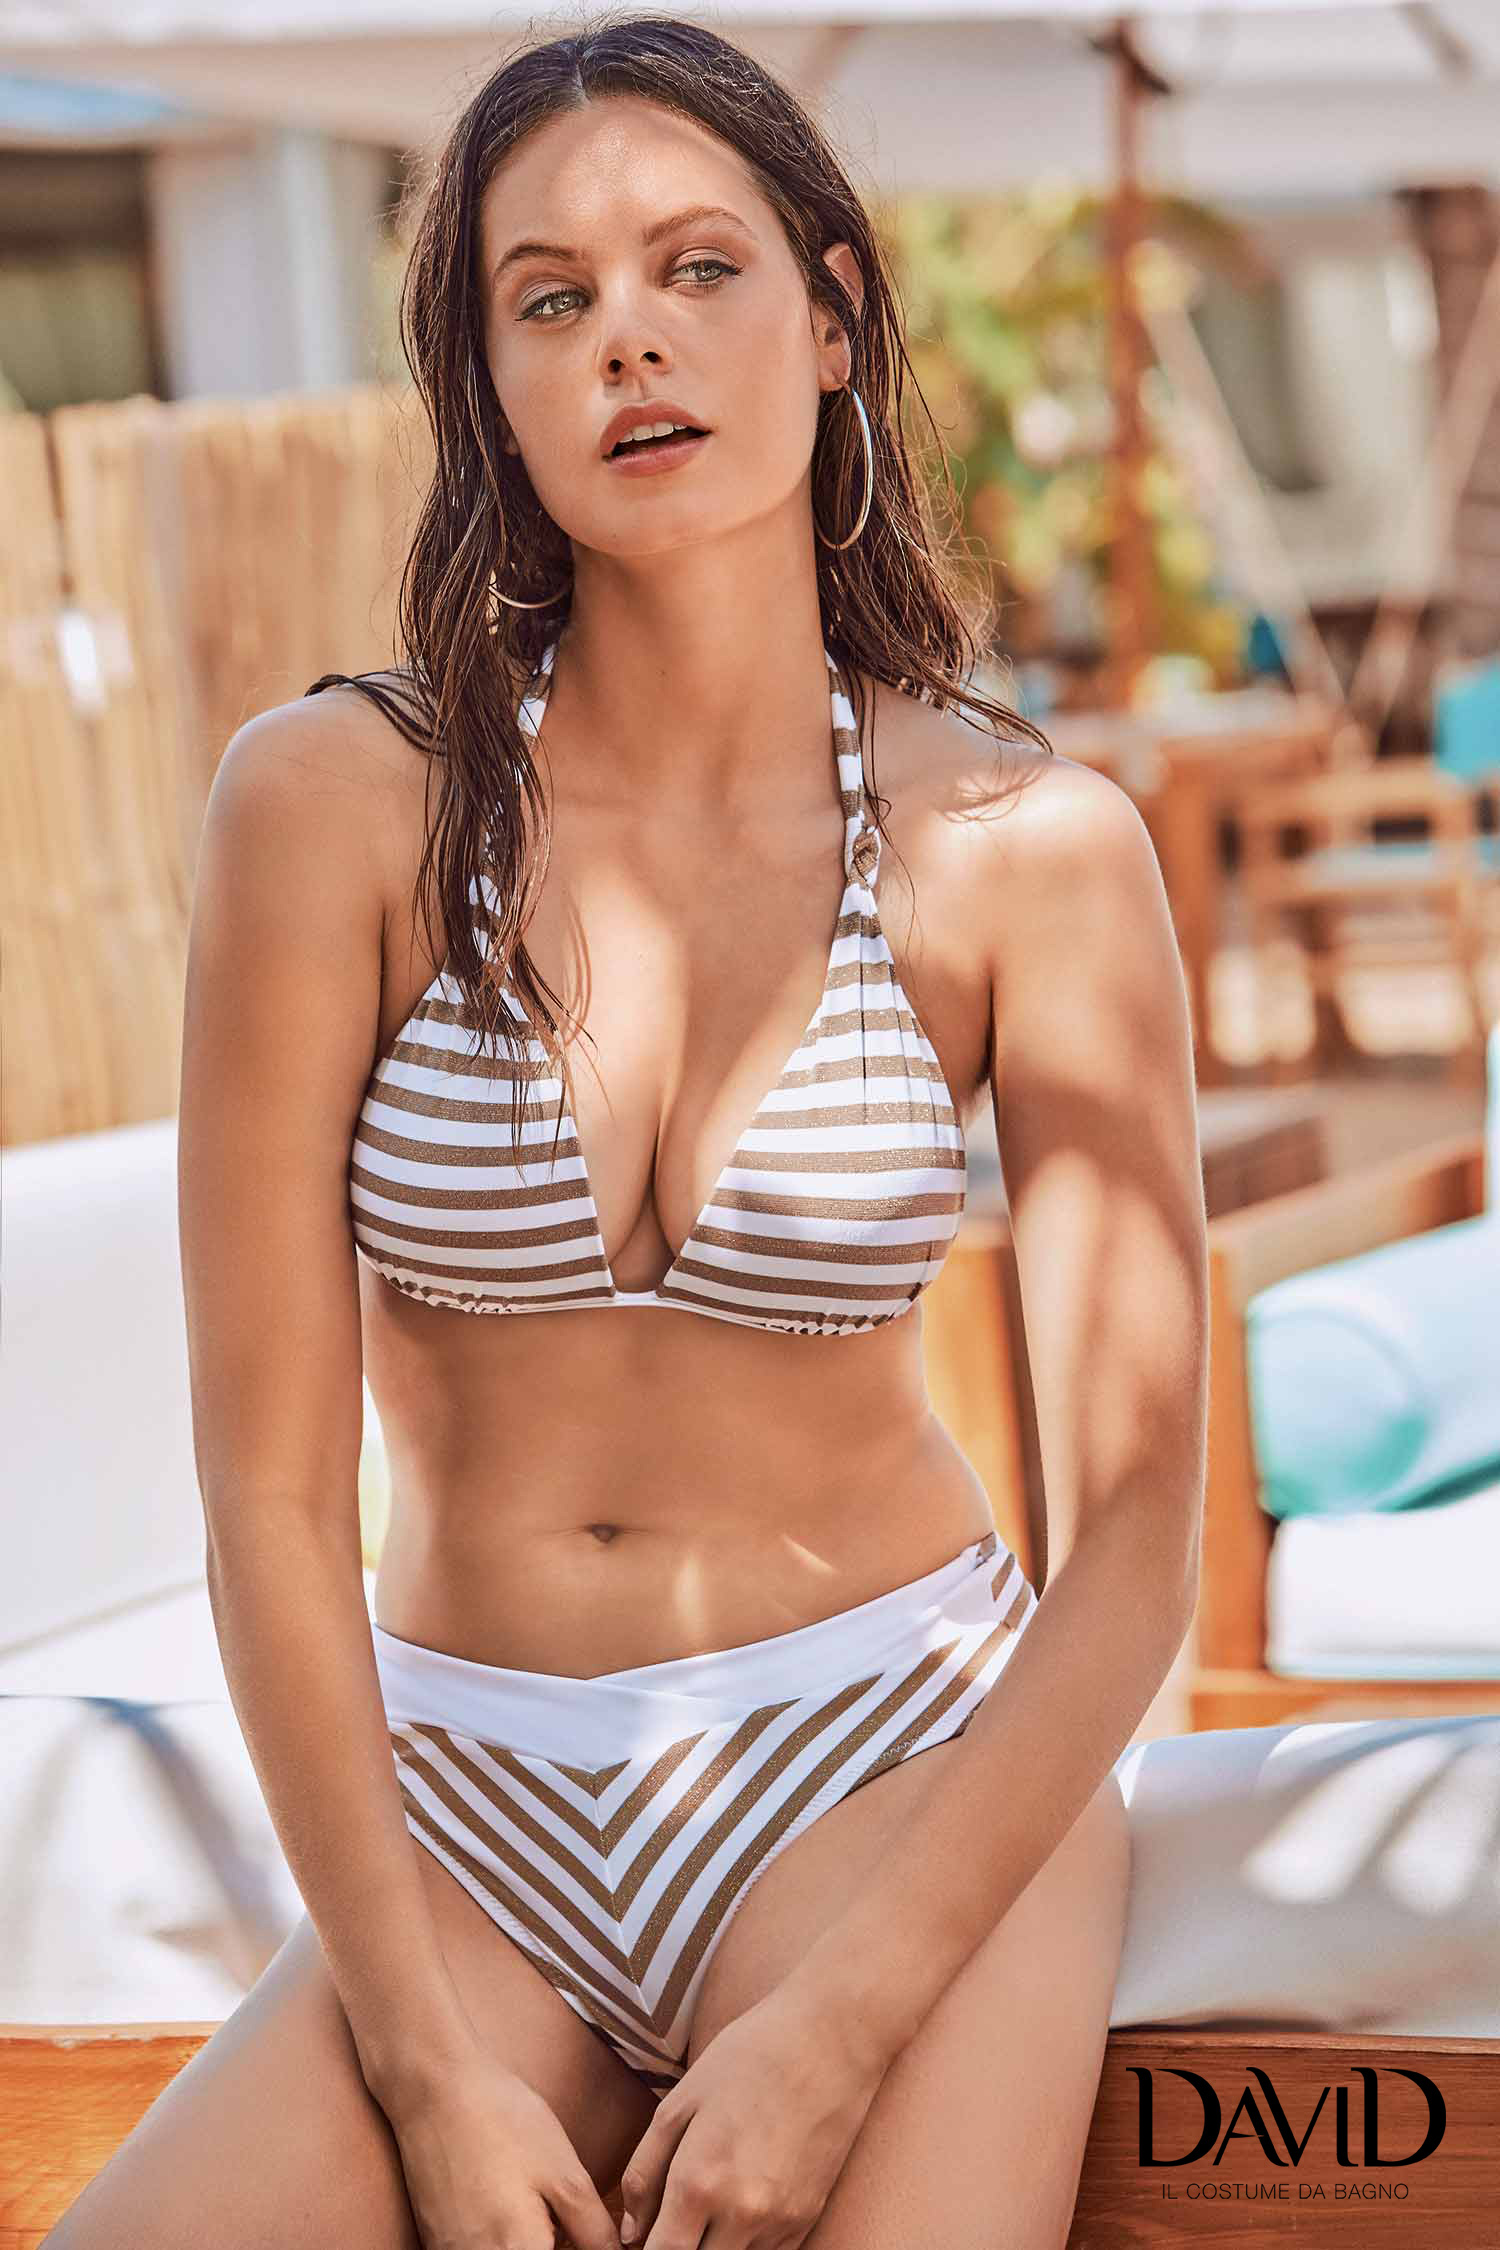 Costume da bagno per donna bikini due pezzi a righe DAVID